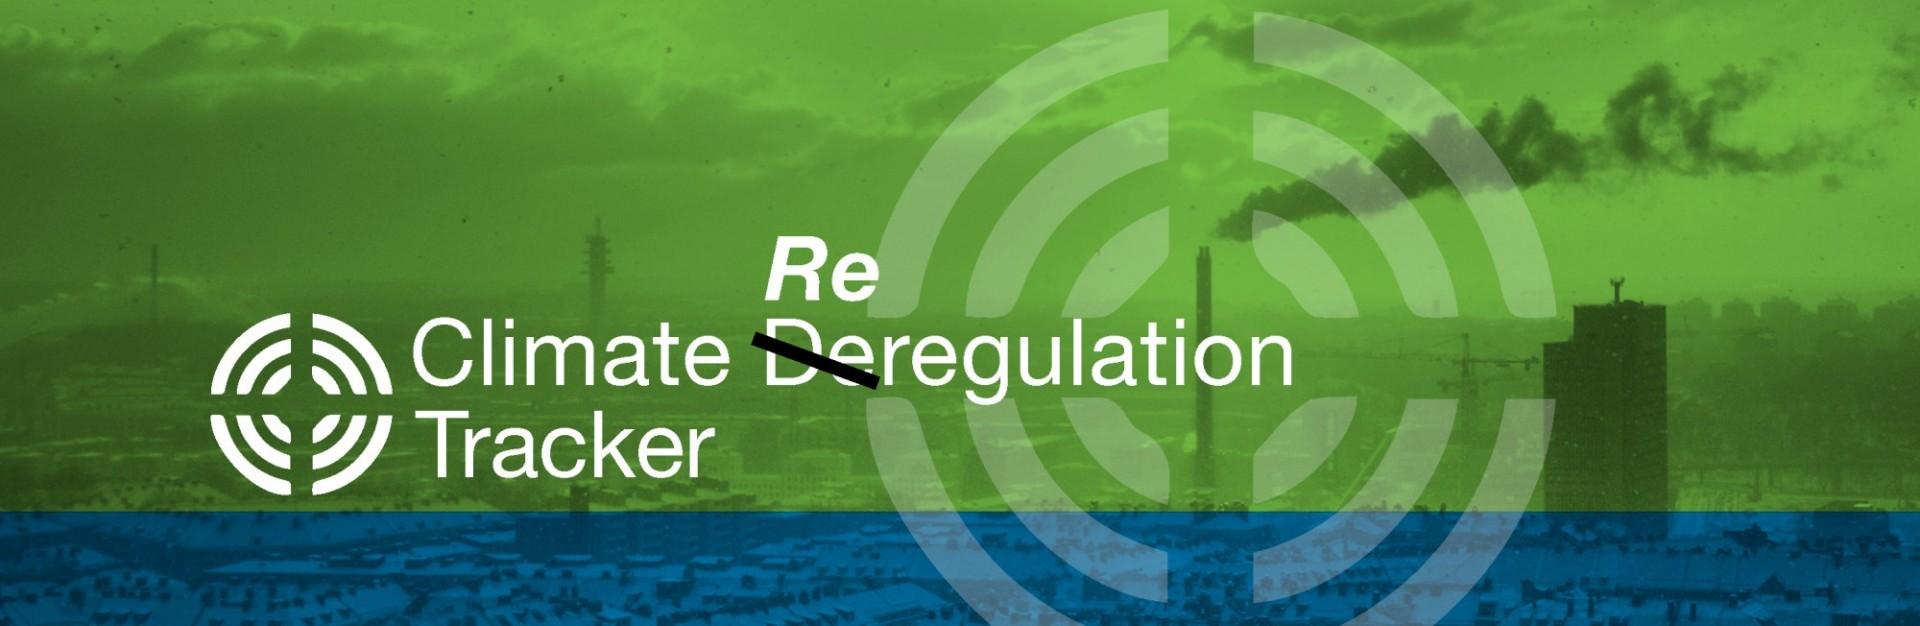 Climate Reregulation Tracker